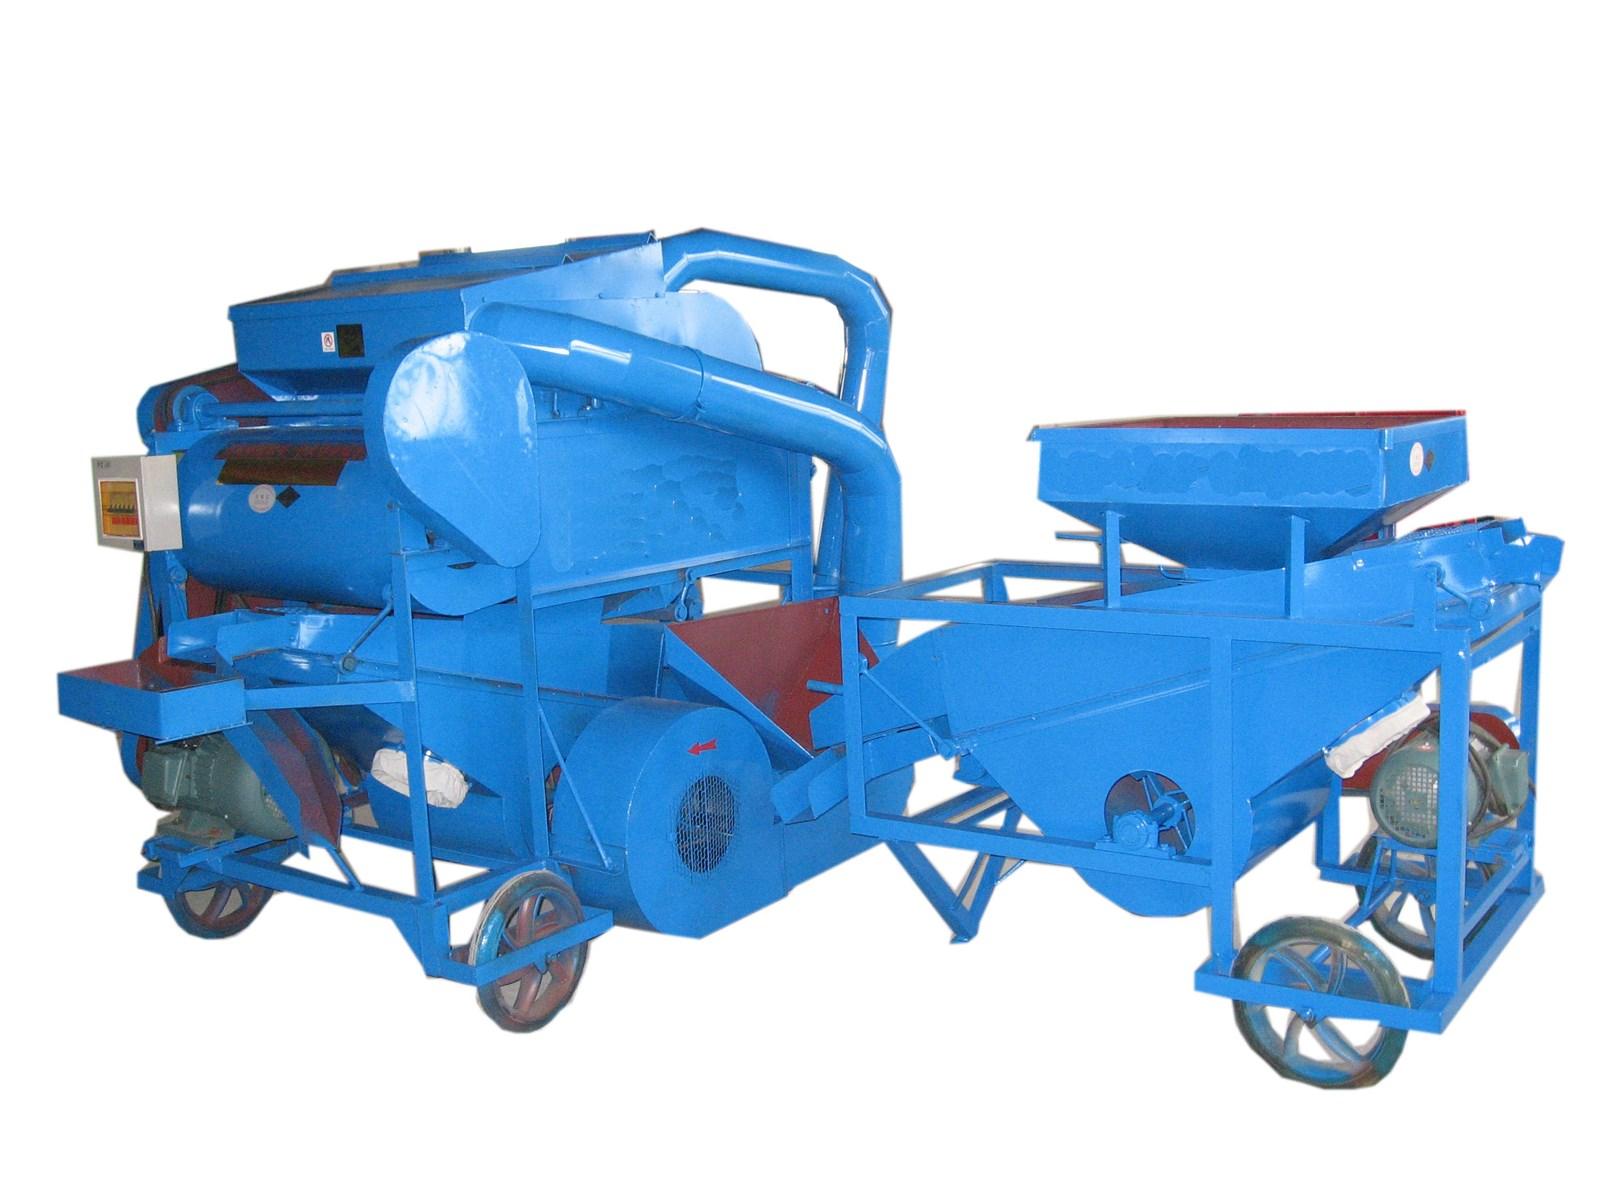 Peanut shelling machinepeanut shellerpignut shelling machine